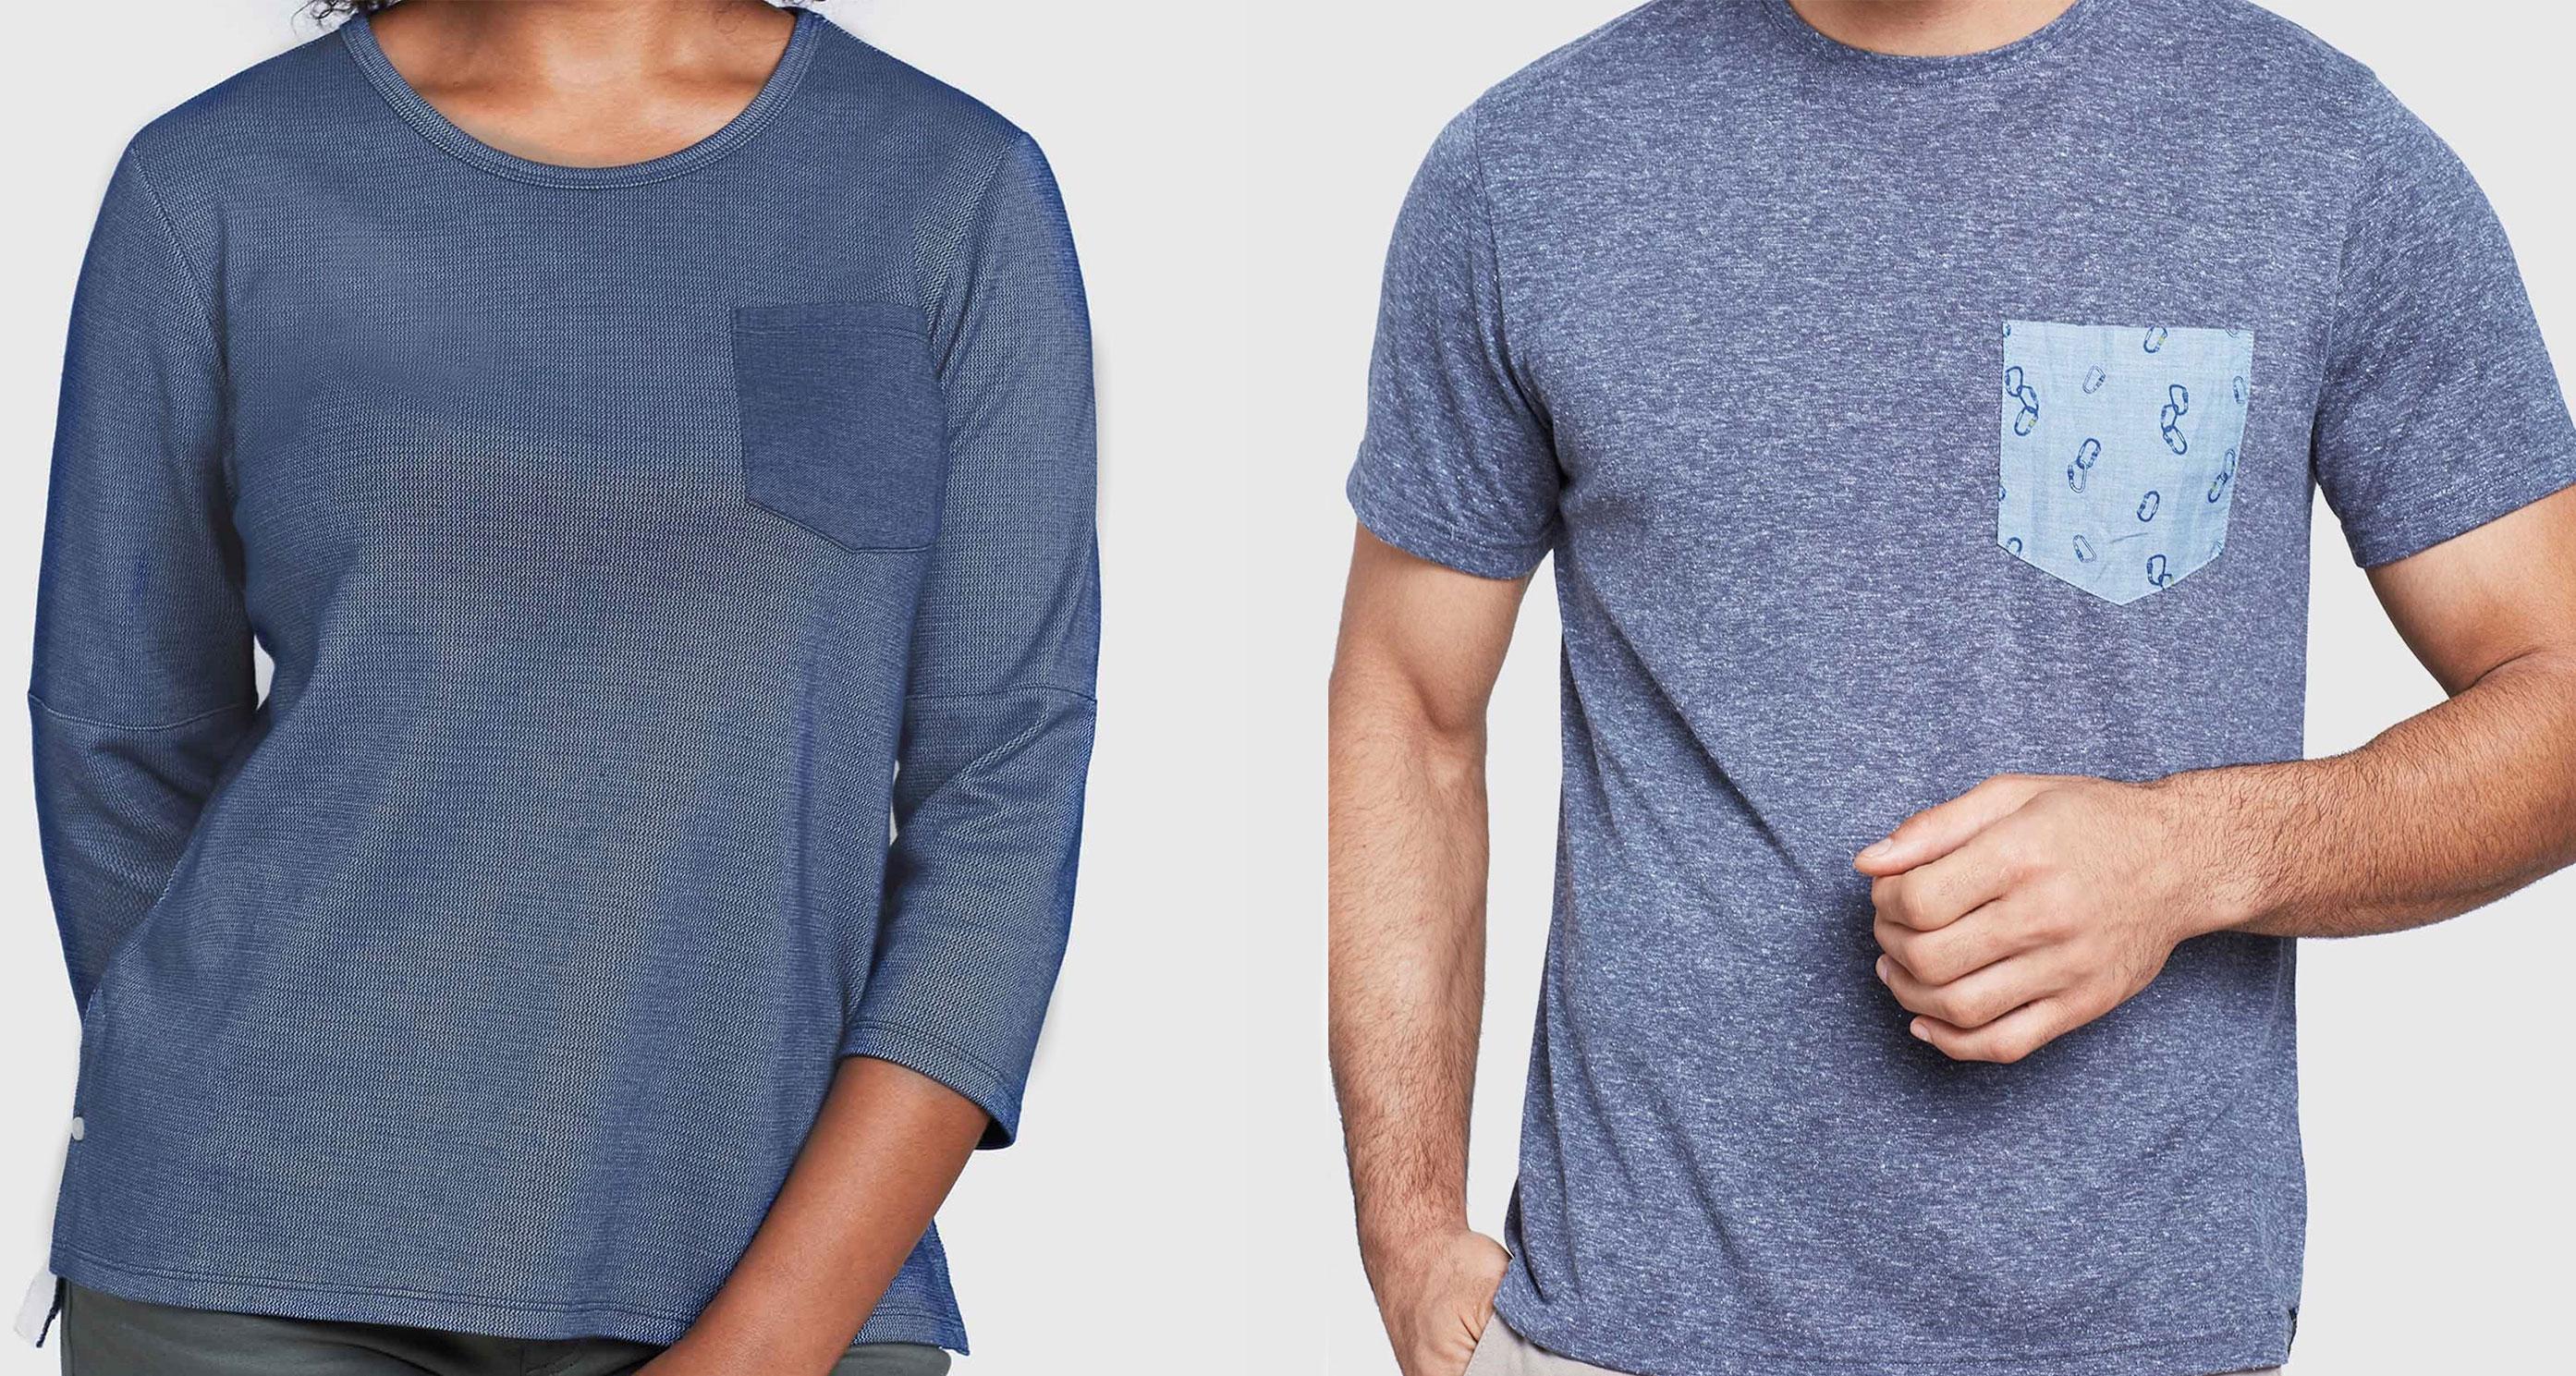 United By Blue Fair Trade shirts